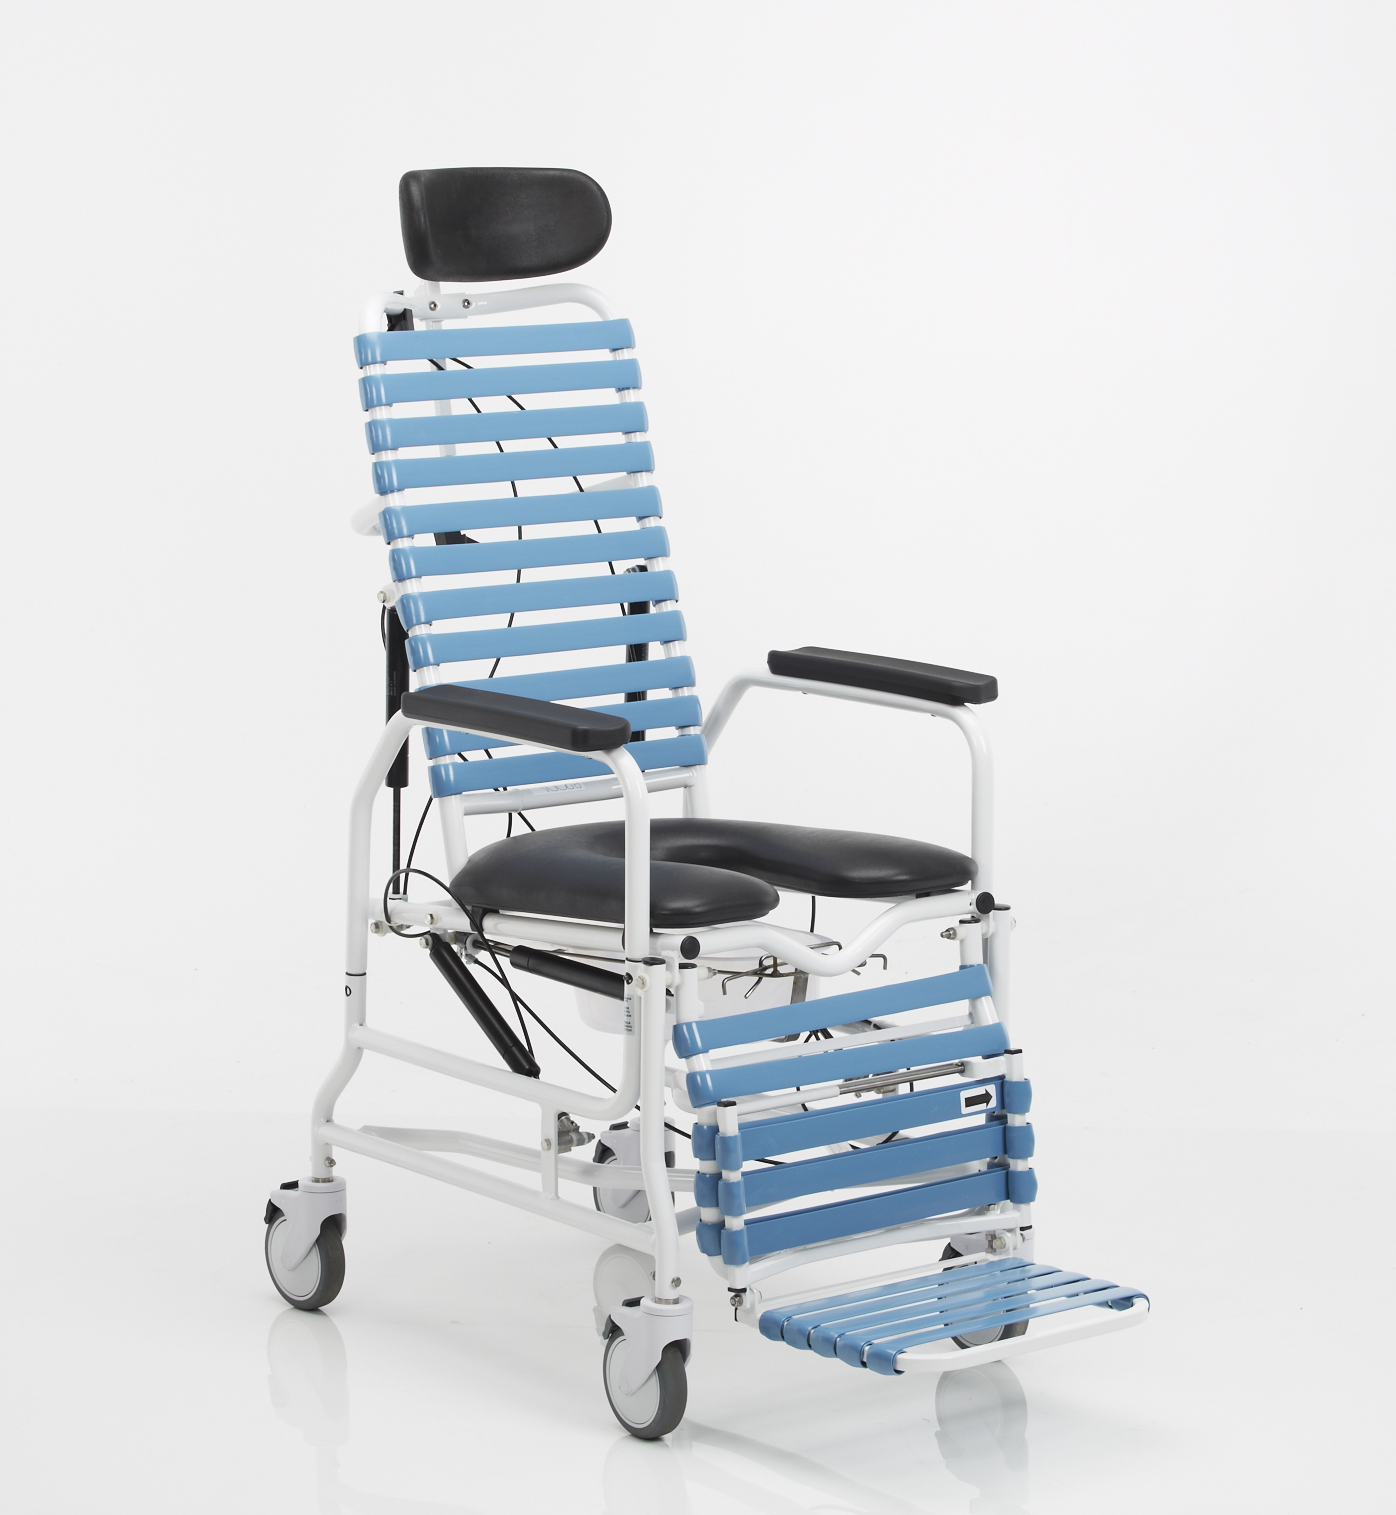 Broda Cs385 Revive Tilt And Recline Shower Commode Chair